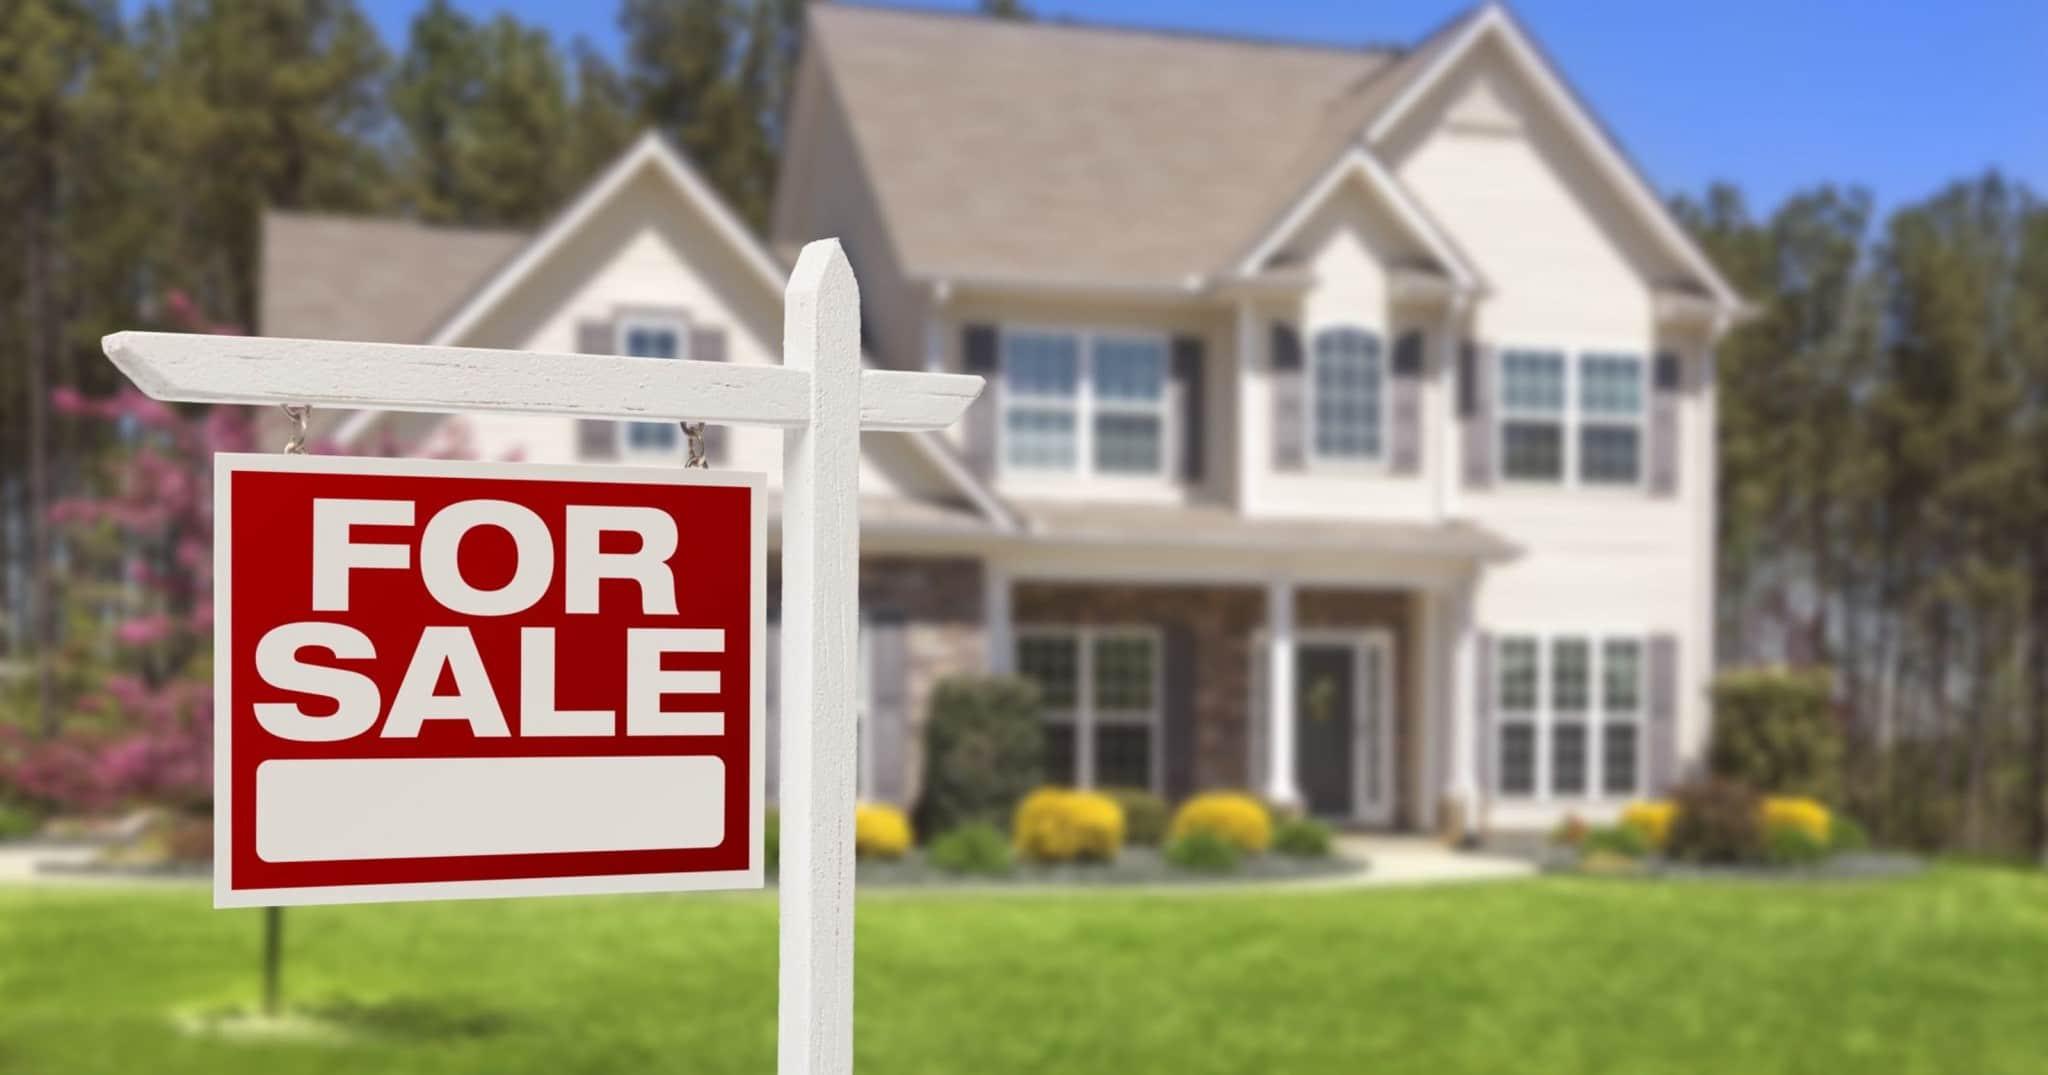 Homes for Sale Oakville, Mississauga, Burlington